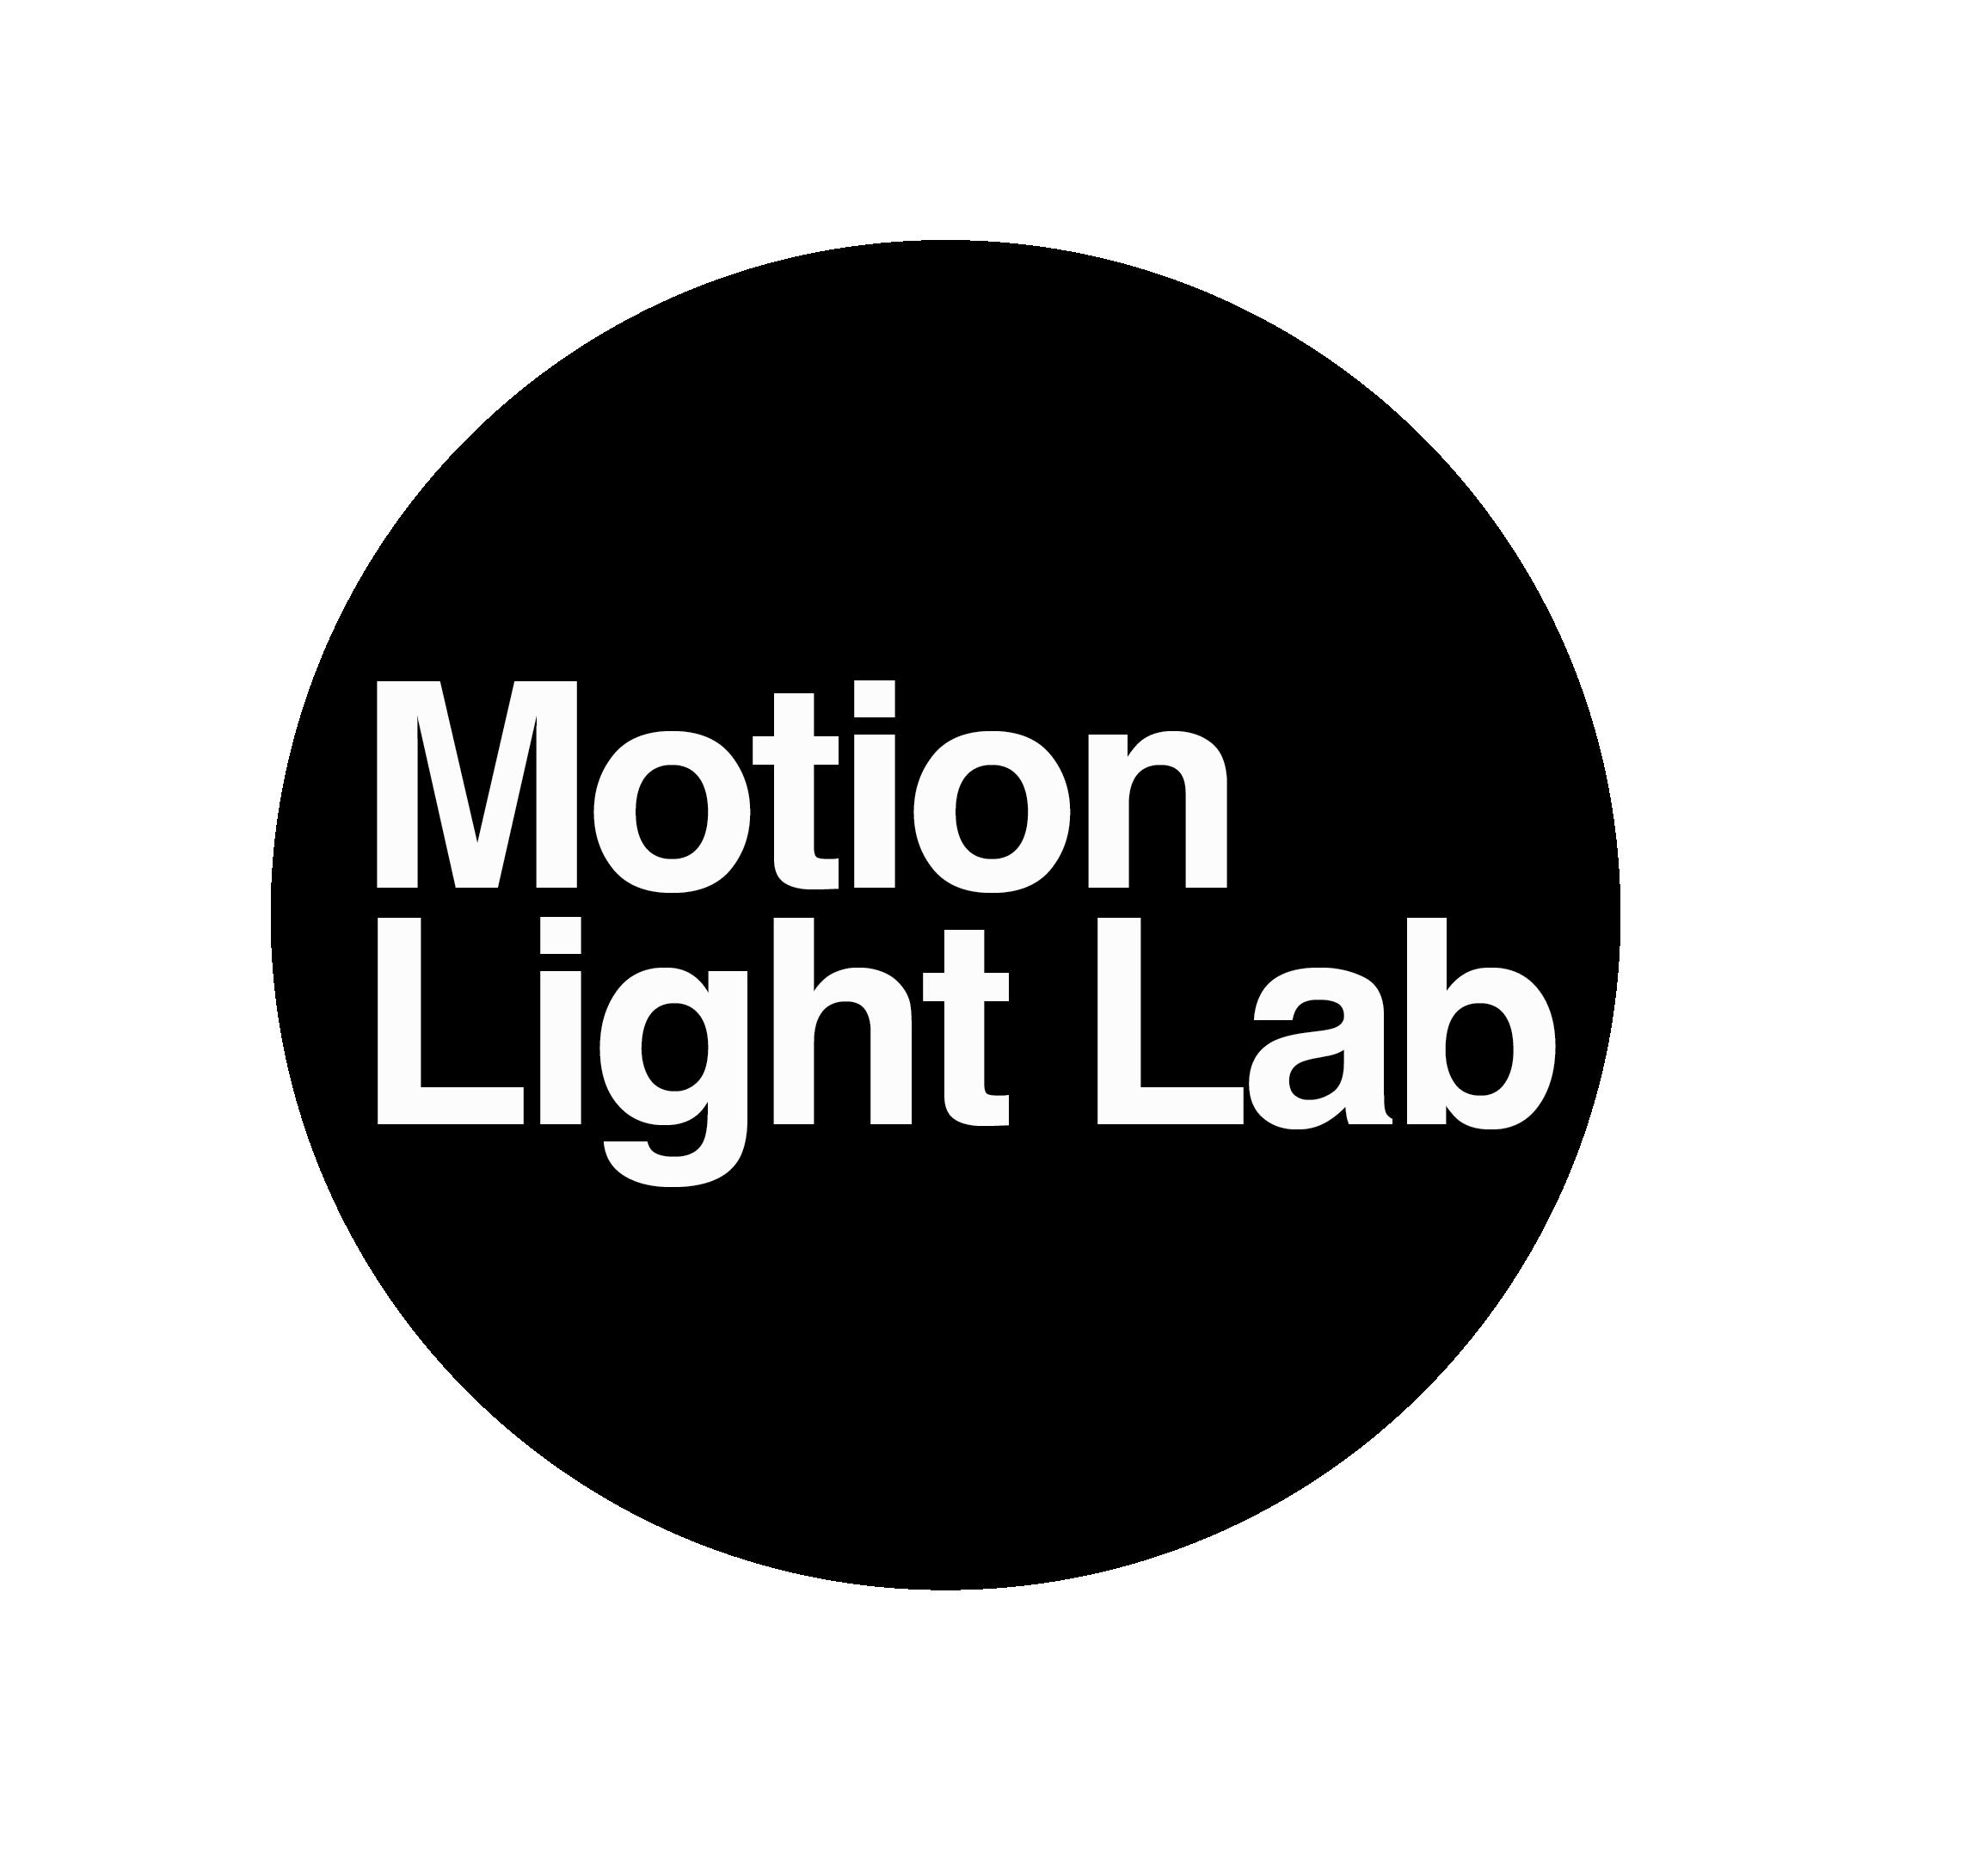 Motion Light Lab